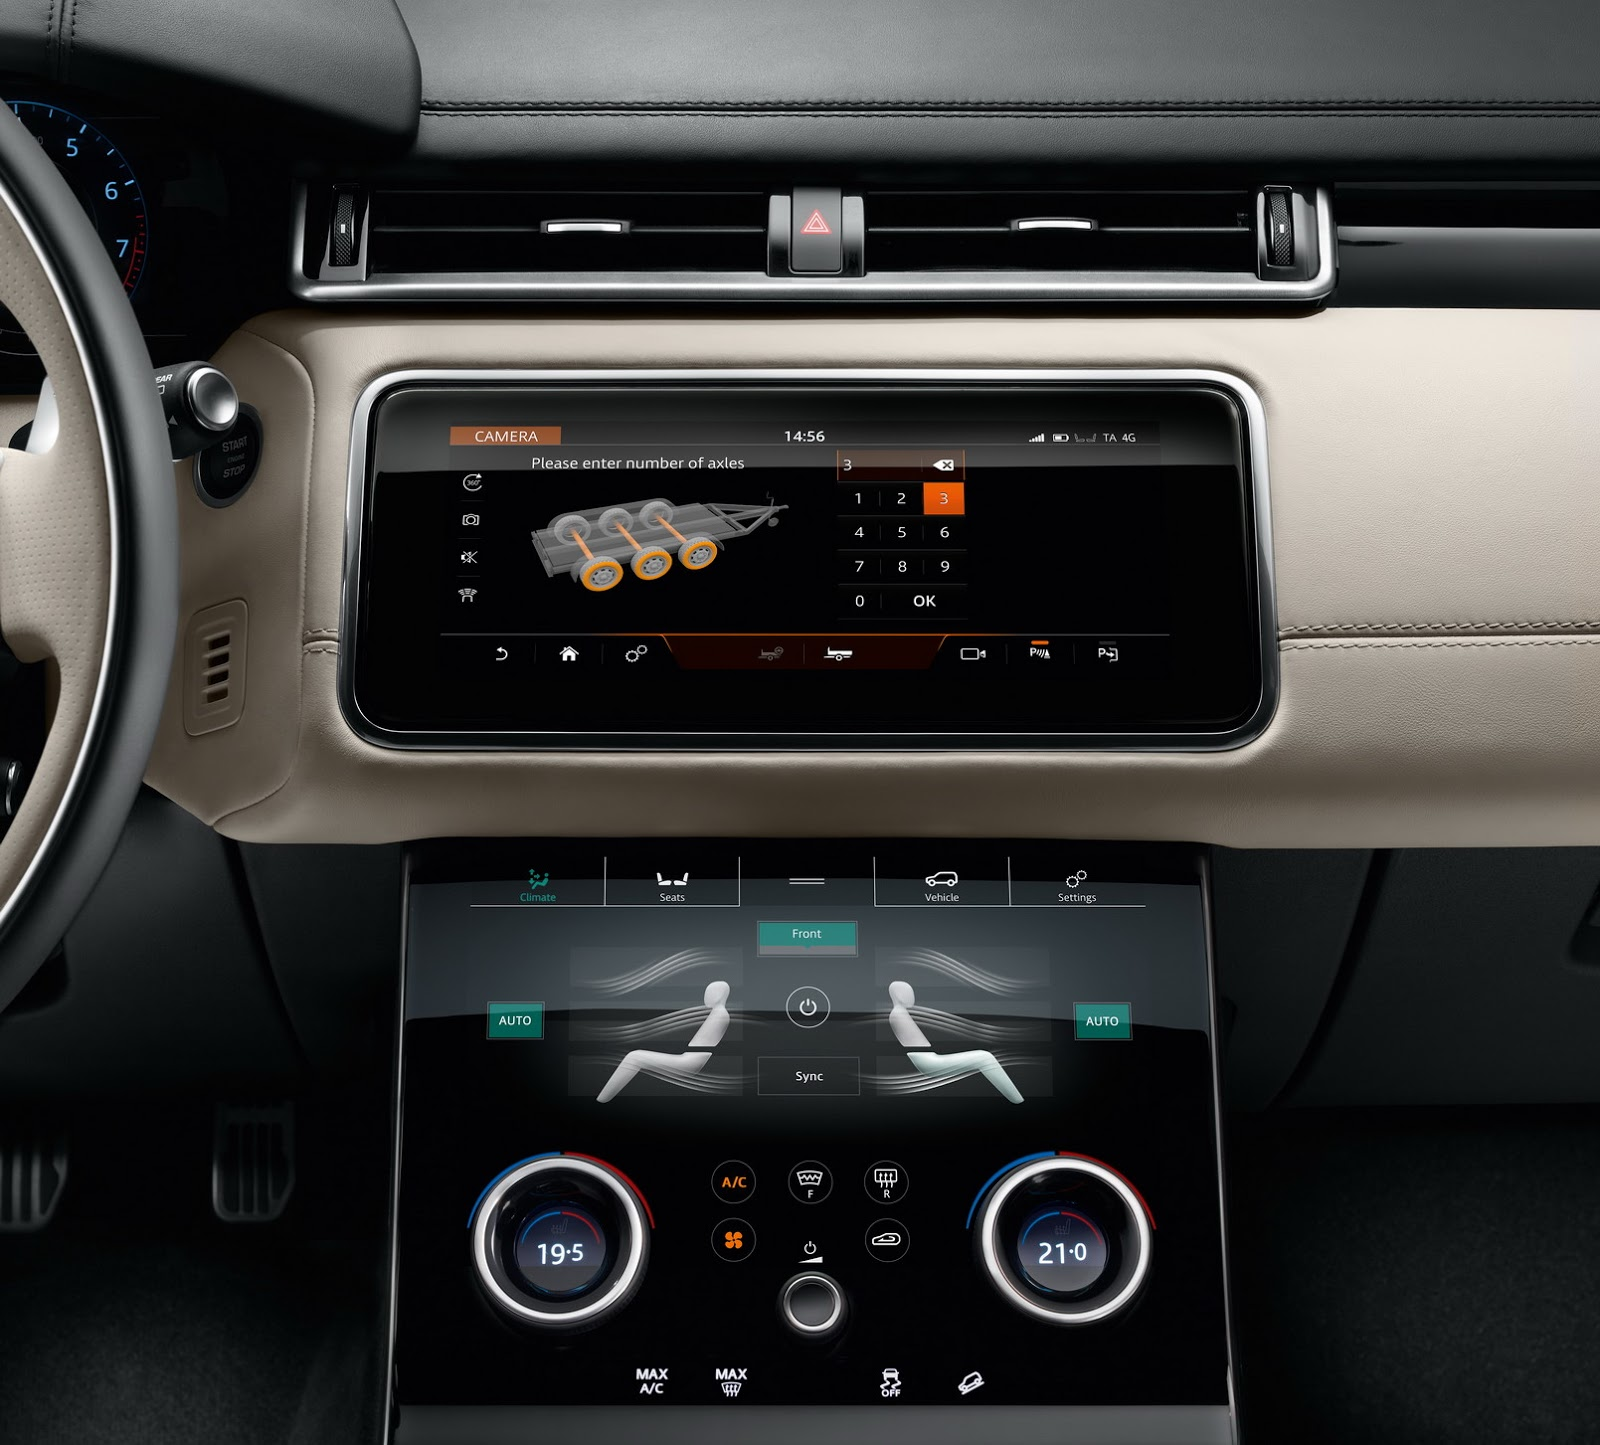 Genuine Quick acting coupling AUDI VW Audi A4 allroad quattro Avant 8E0201263G